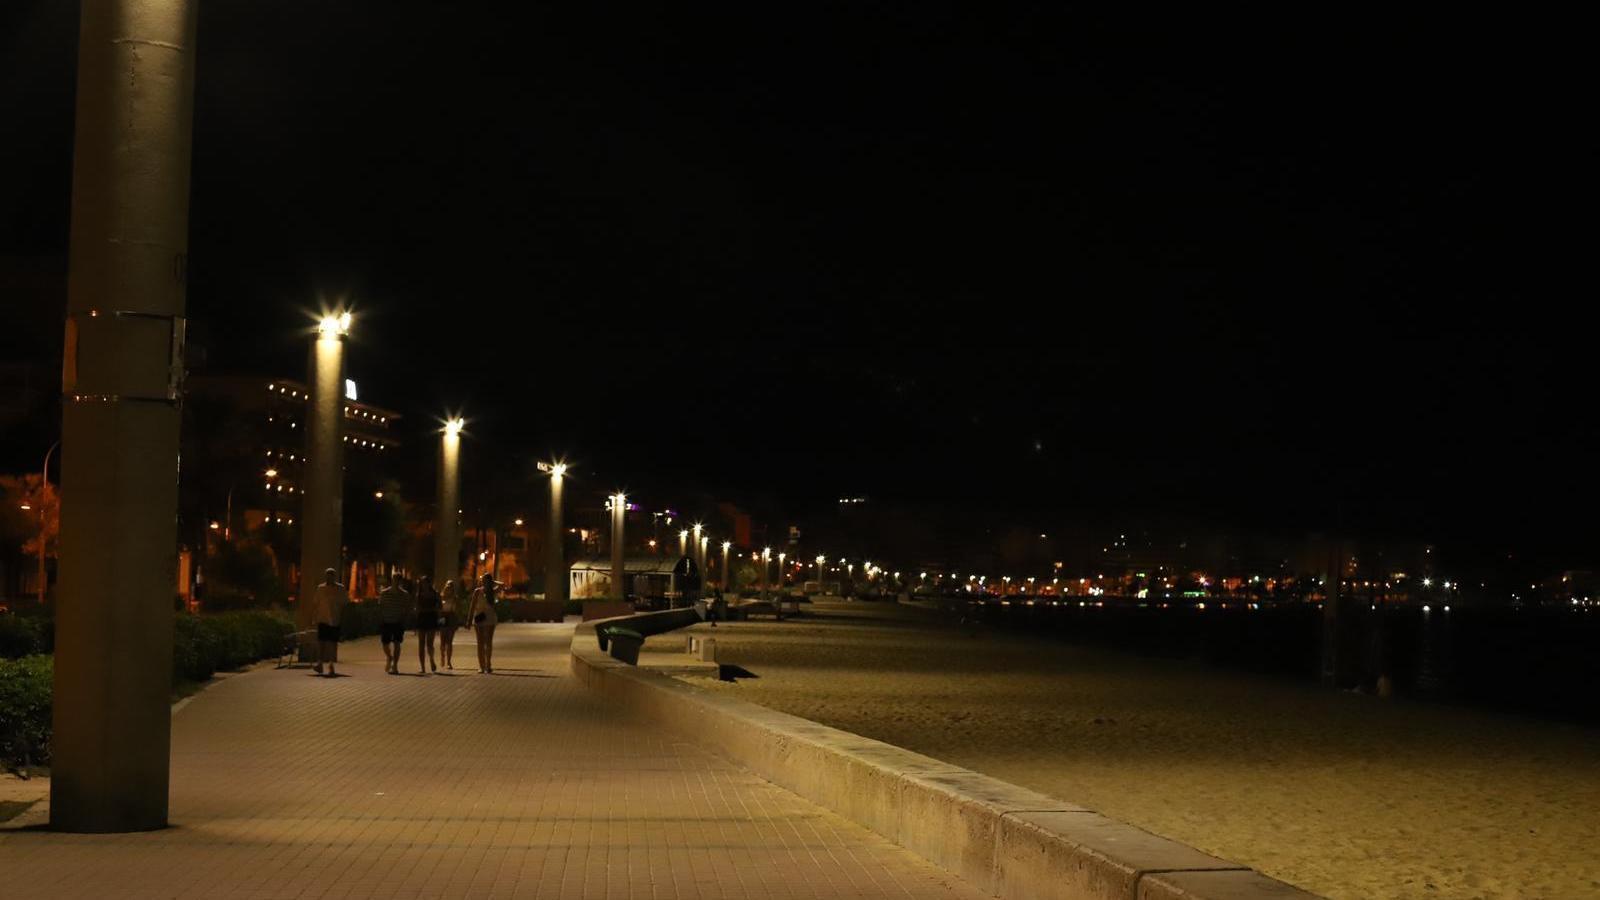 El Passeig Marítim de la Platja de Palma buit en ple mes de juliol.